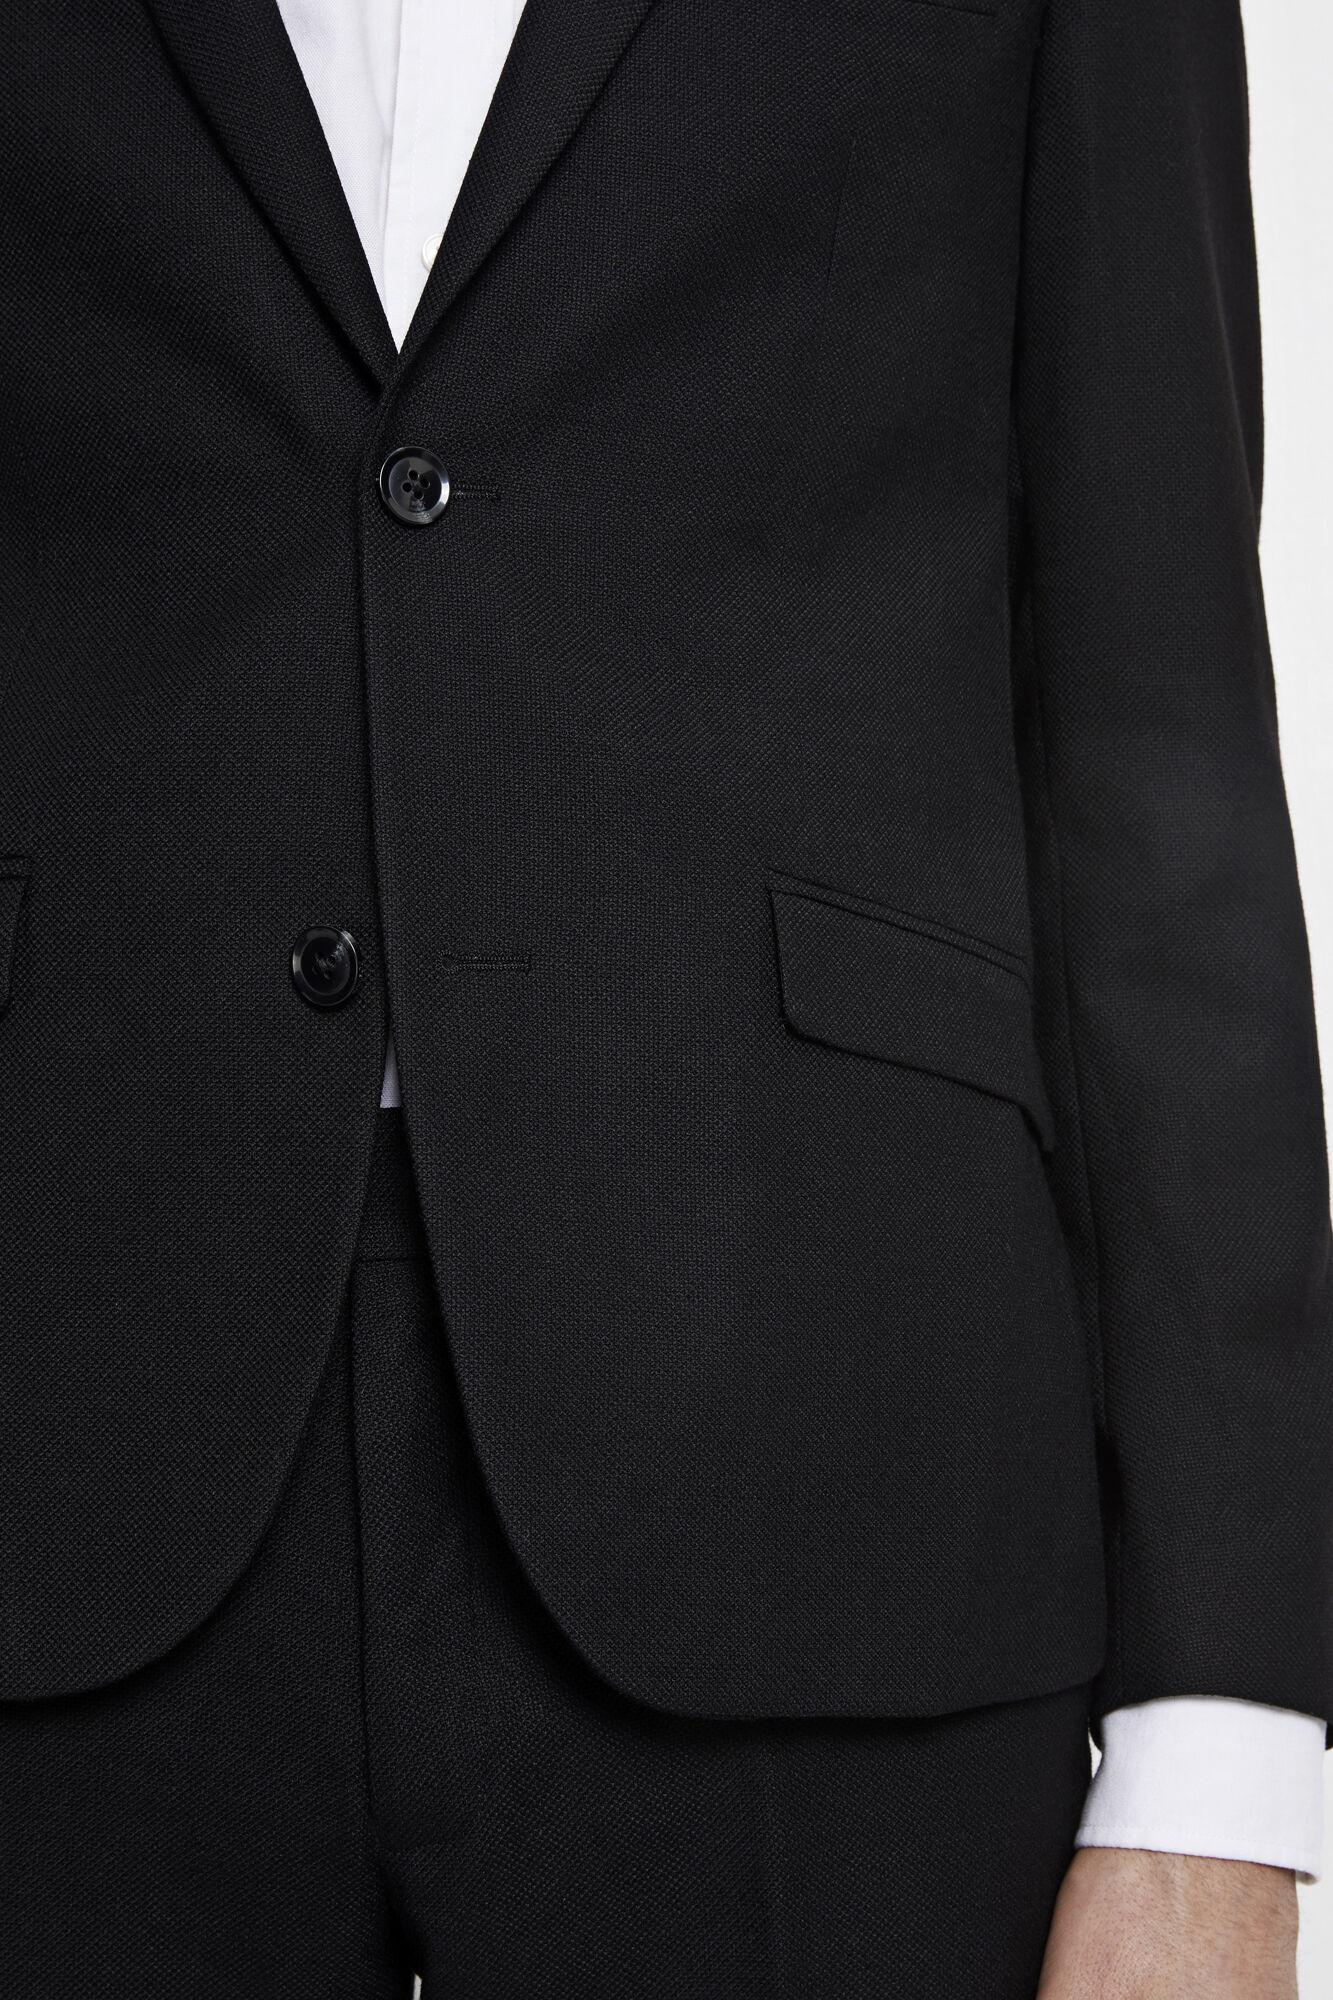 Edger A blazer 6567, BLACK